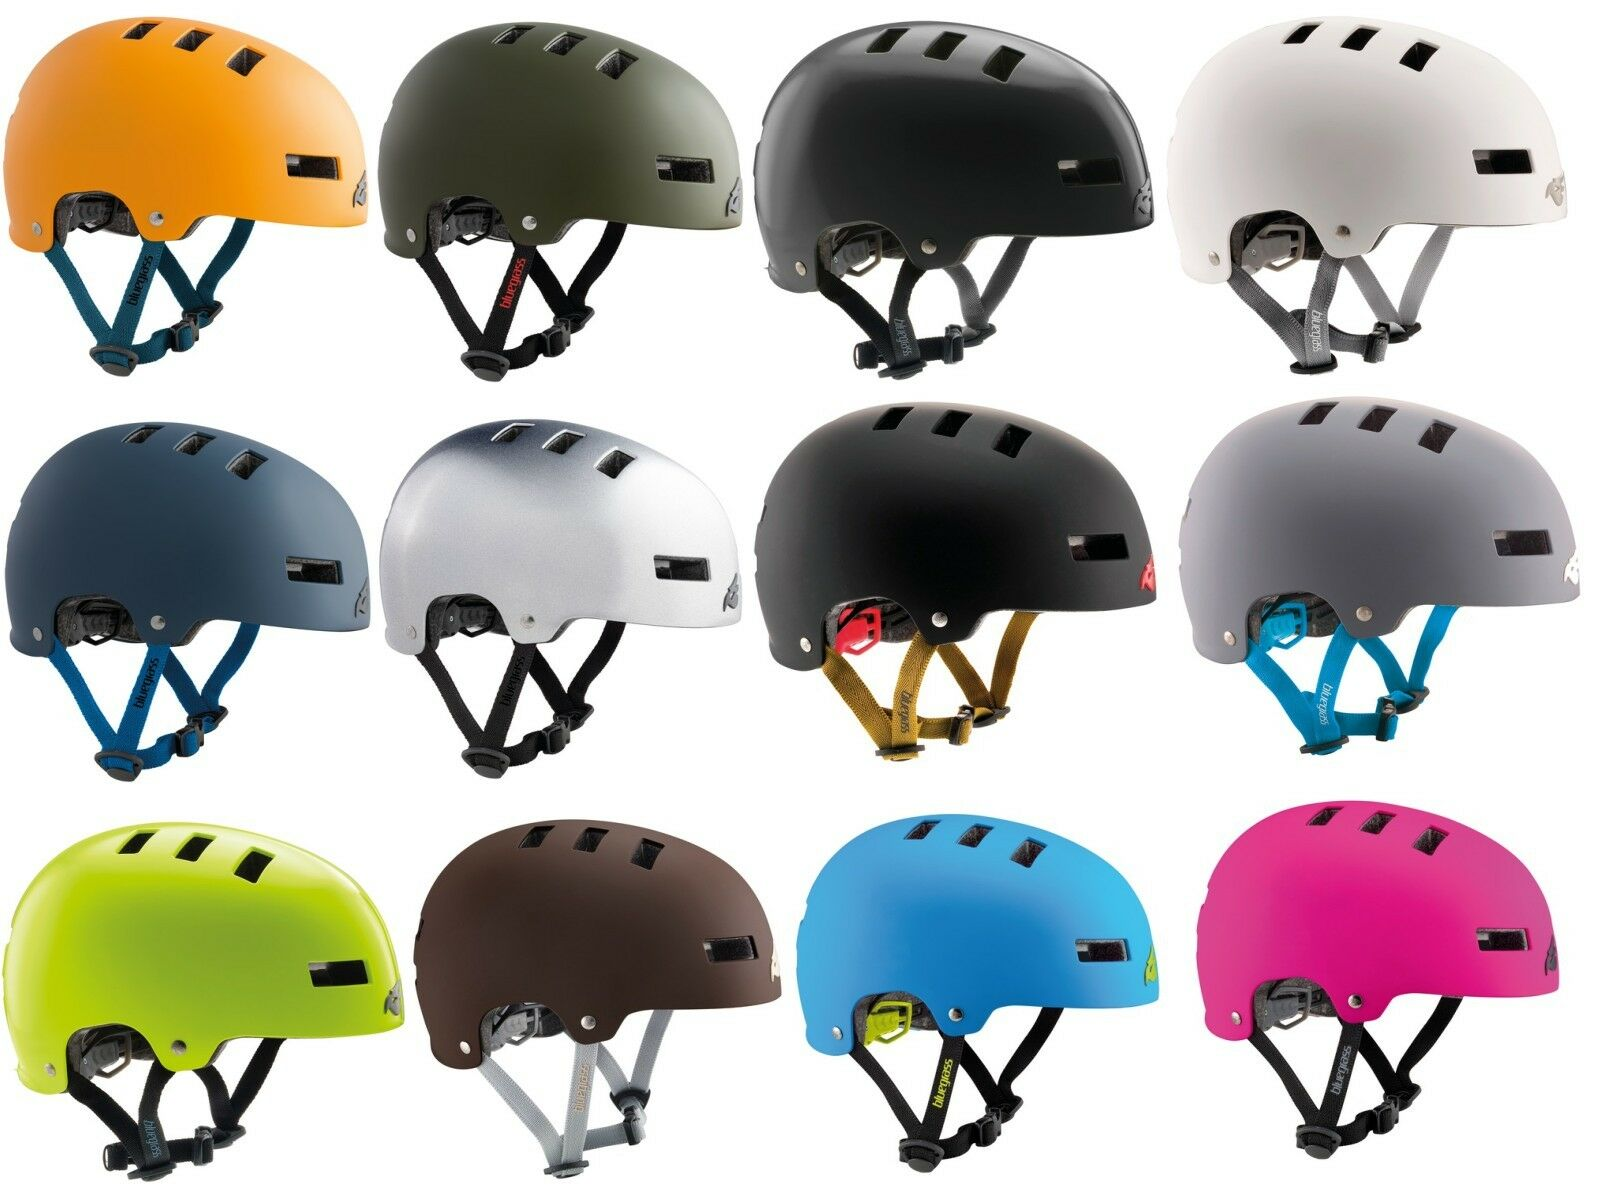 BlauGRASS Fahrradhelm Fahrradhelm Fahrradhelm Dirt-Helm Super Bold - diverse Farben   Muster 1575cc